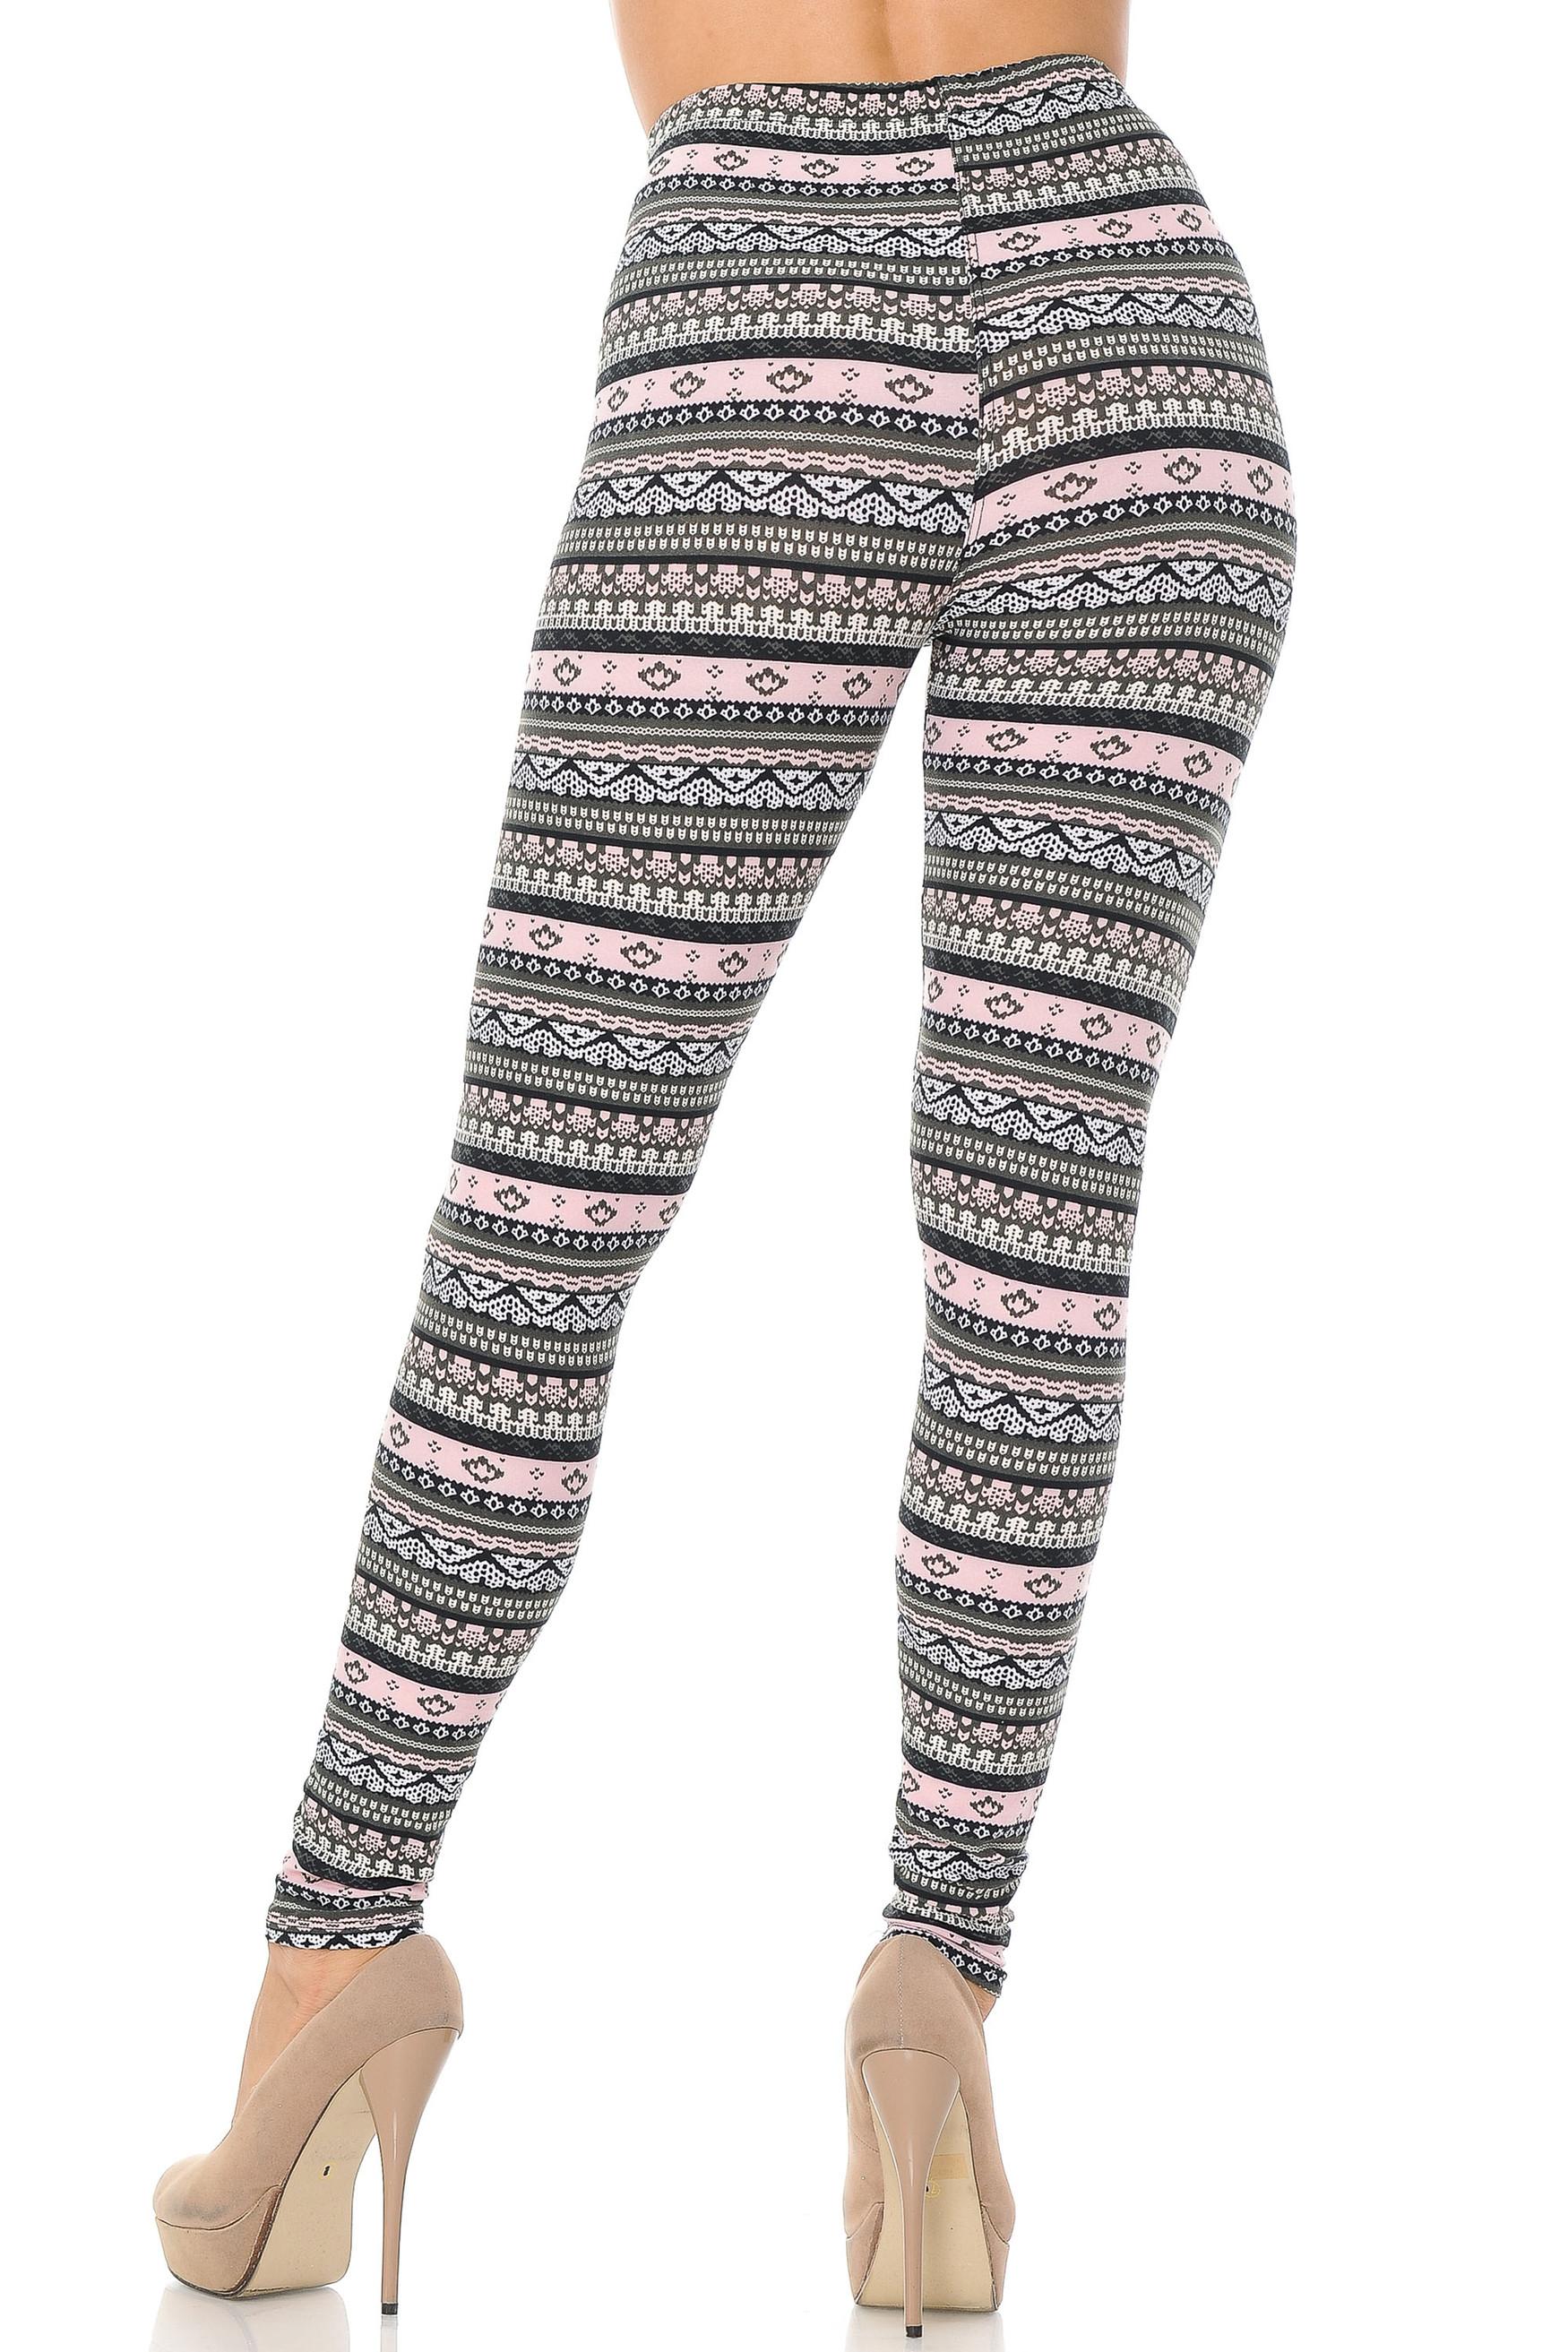 Brushed Dainty Pink Wrap Leggings